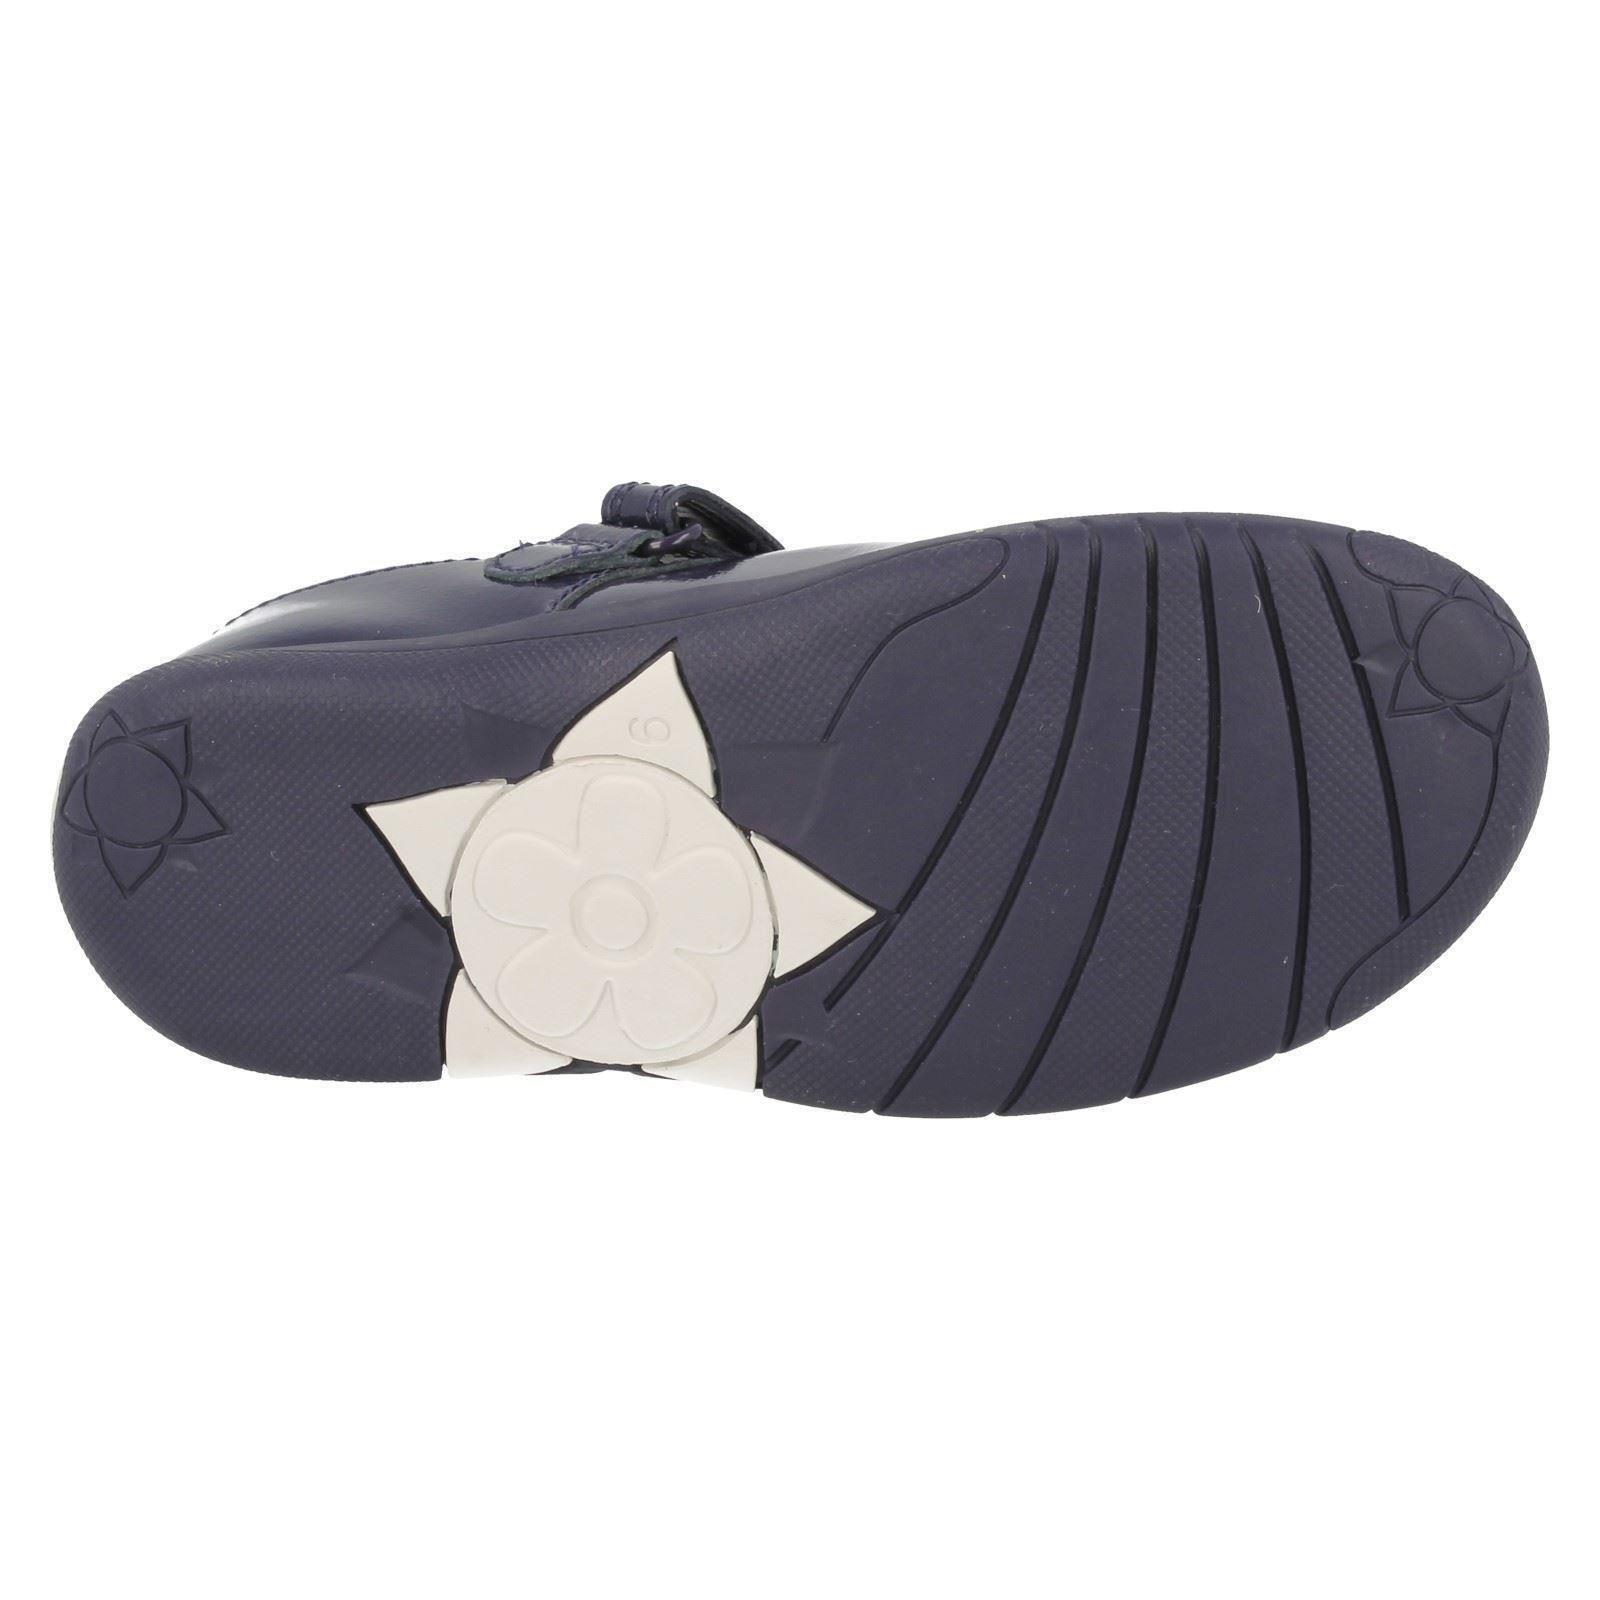 Girls Clarks Casual Shoes Style - Binnie Jam